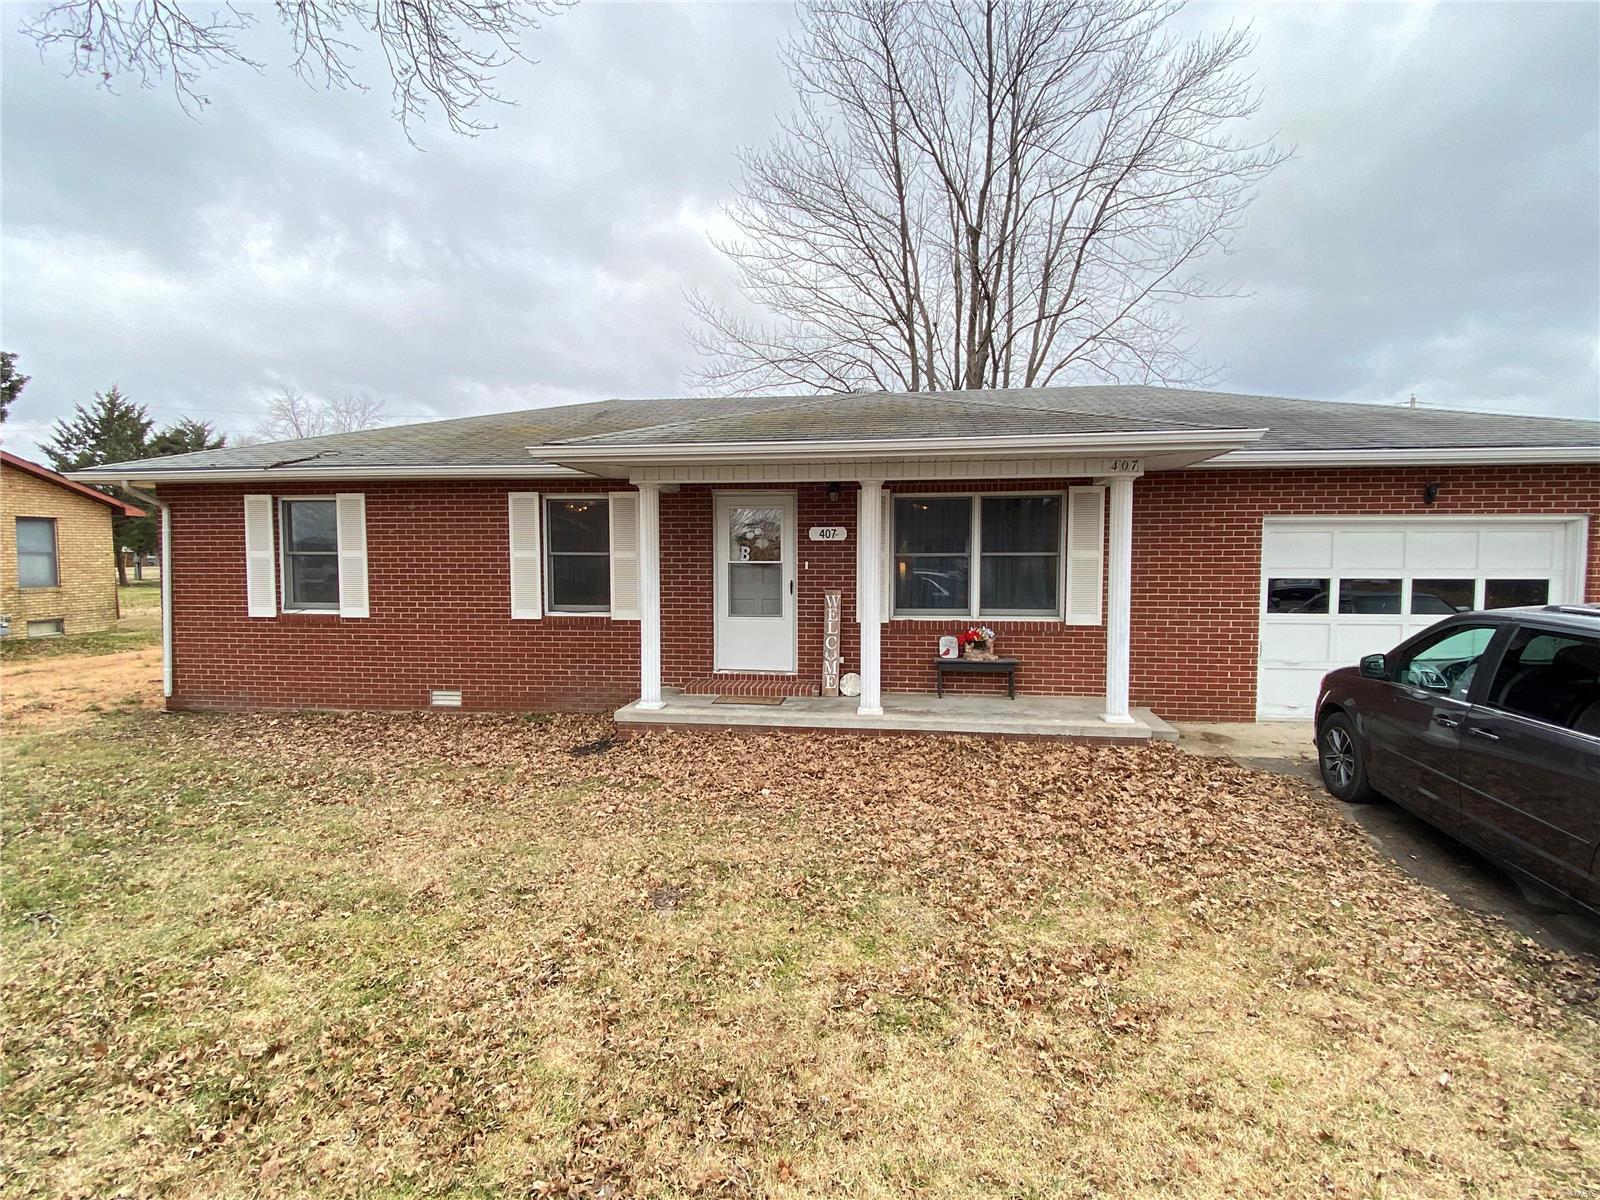 407 N Croy Property Photo - Advance, MO real estate listing